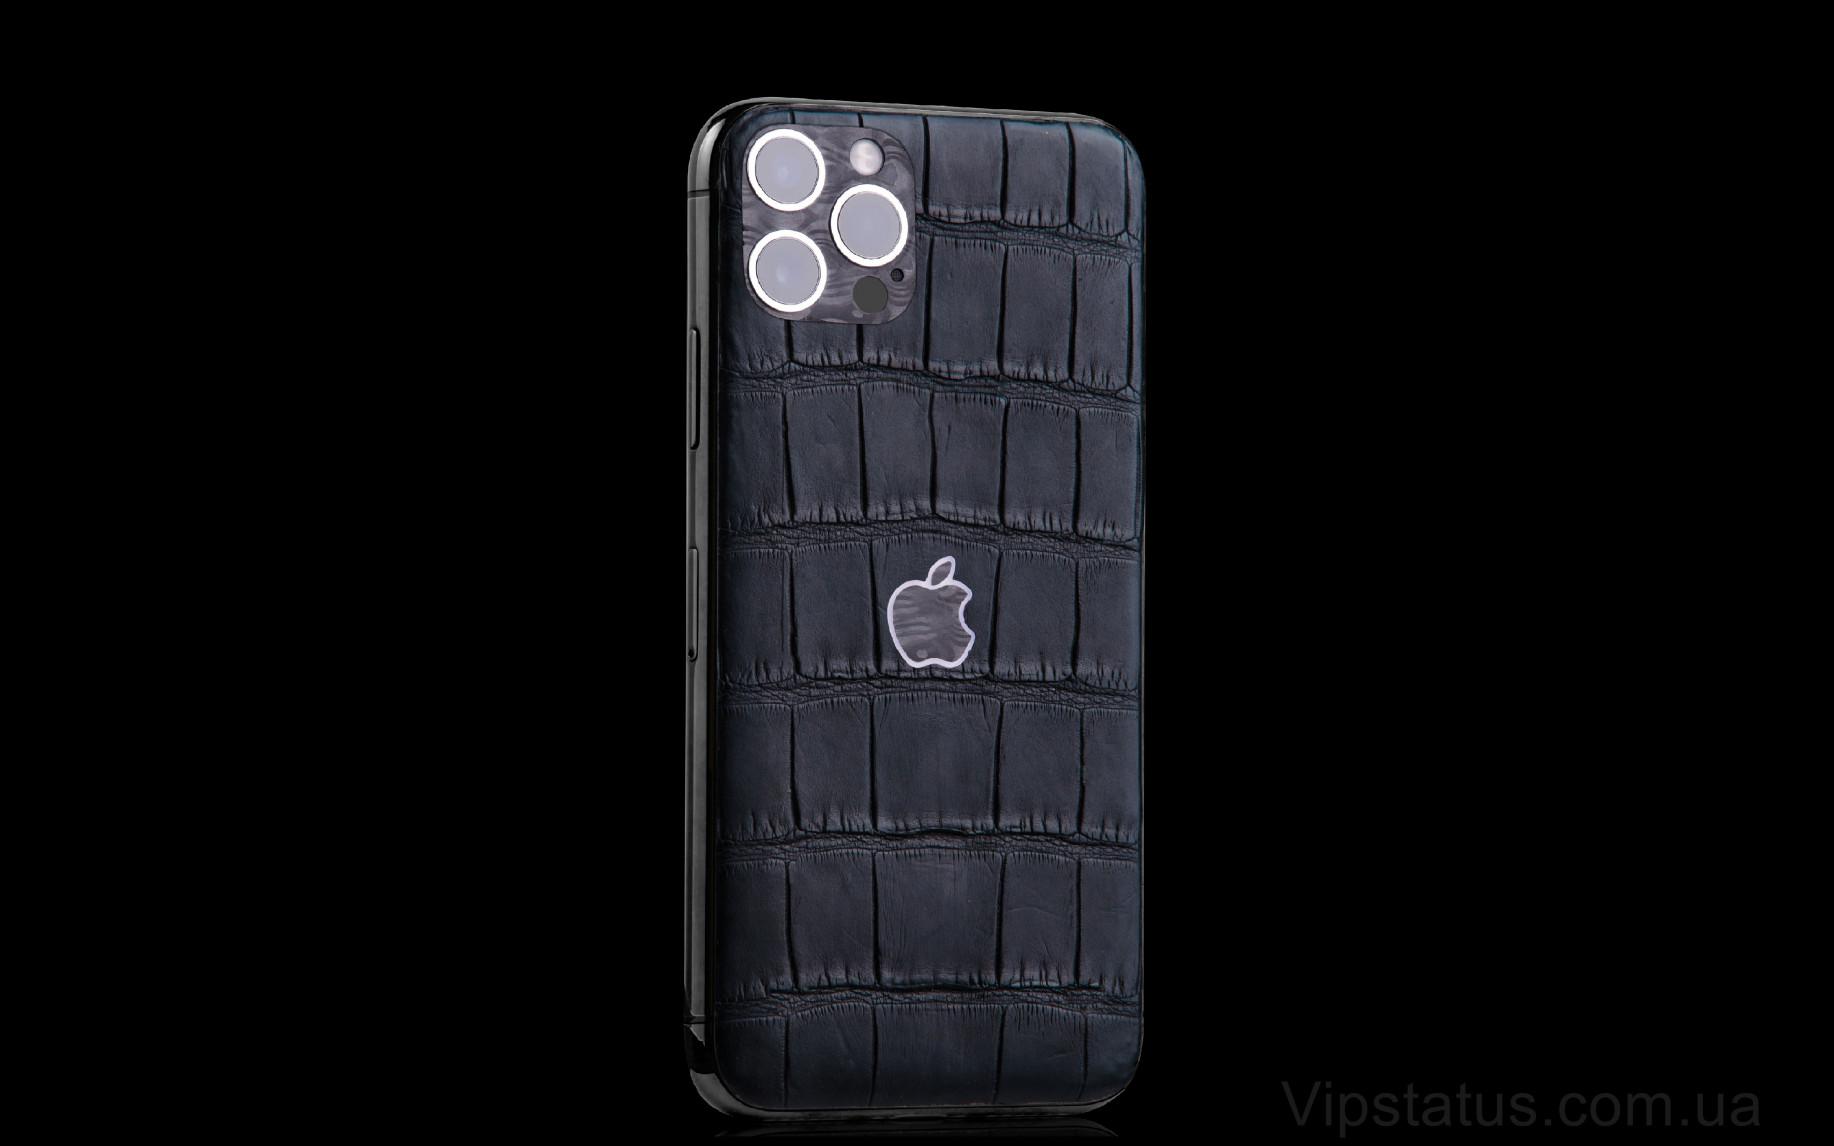 Elite Black Lord Carbon IPHONE 12 PRO MAX 512 GB Black Lord Carbon IPHONE 12 PRO MAX 512 GB image 1